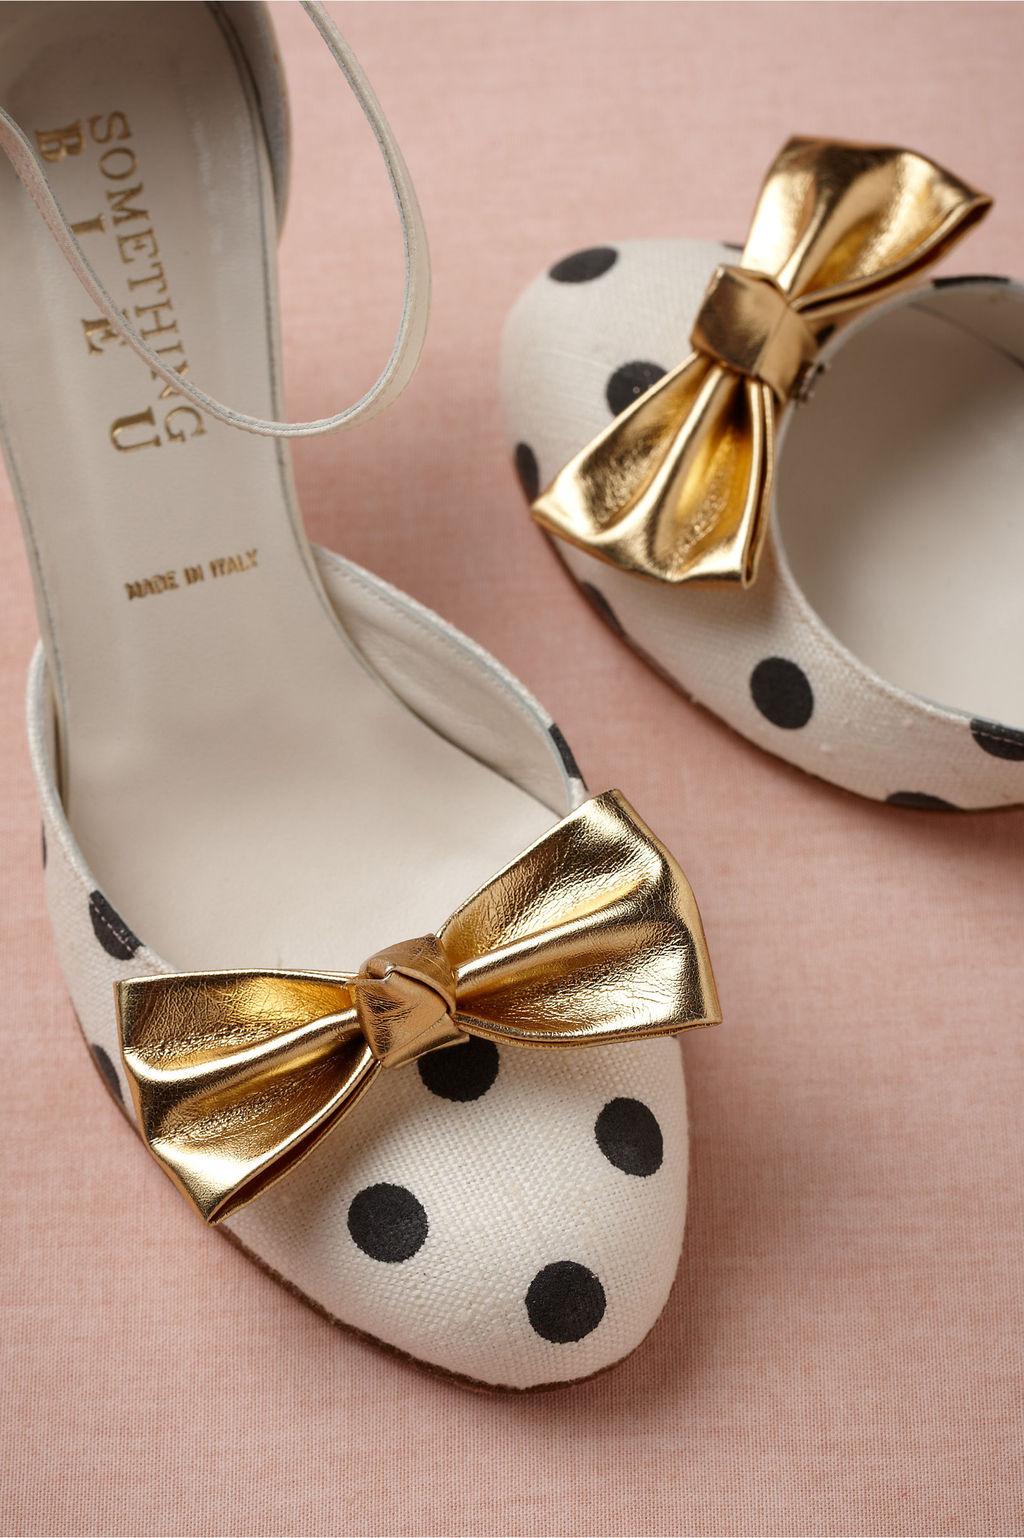 Bhldn-bridal-accessories-for-vintage-weddings-polka-dot-shoe.full